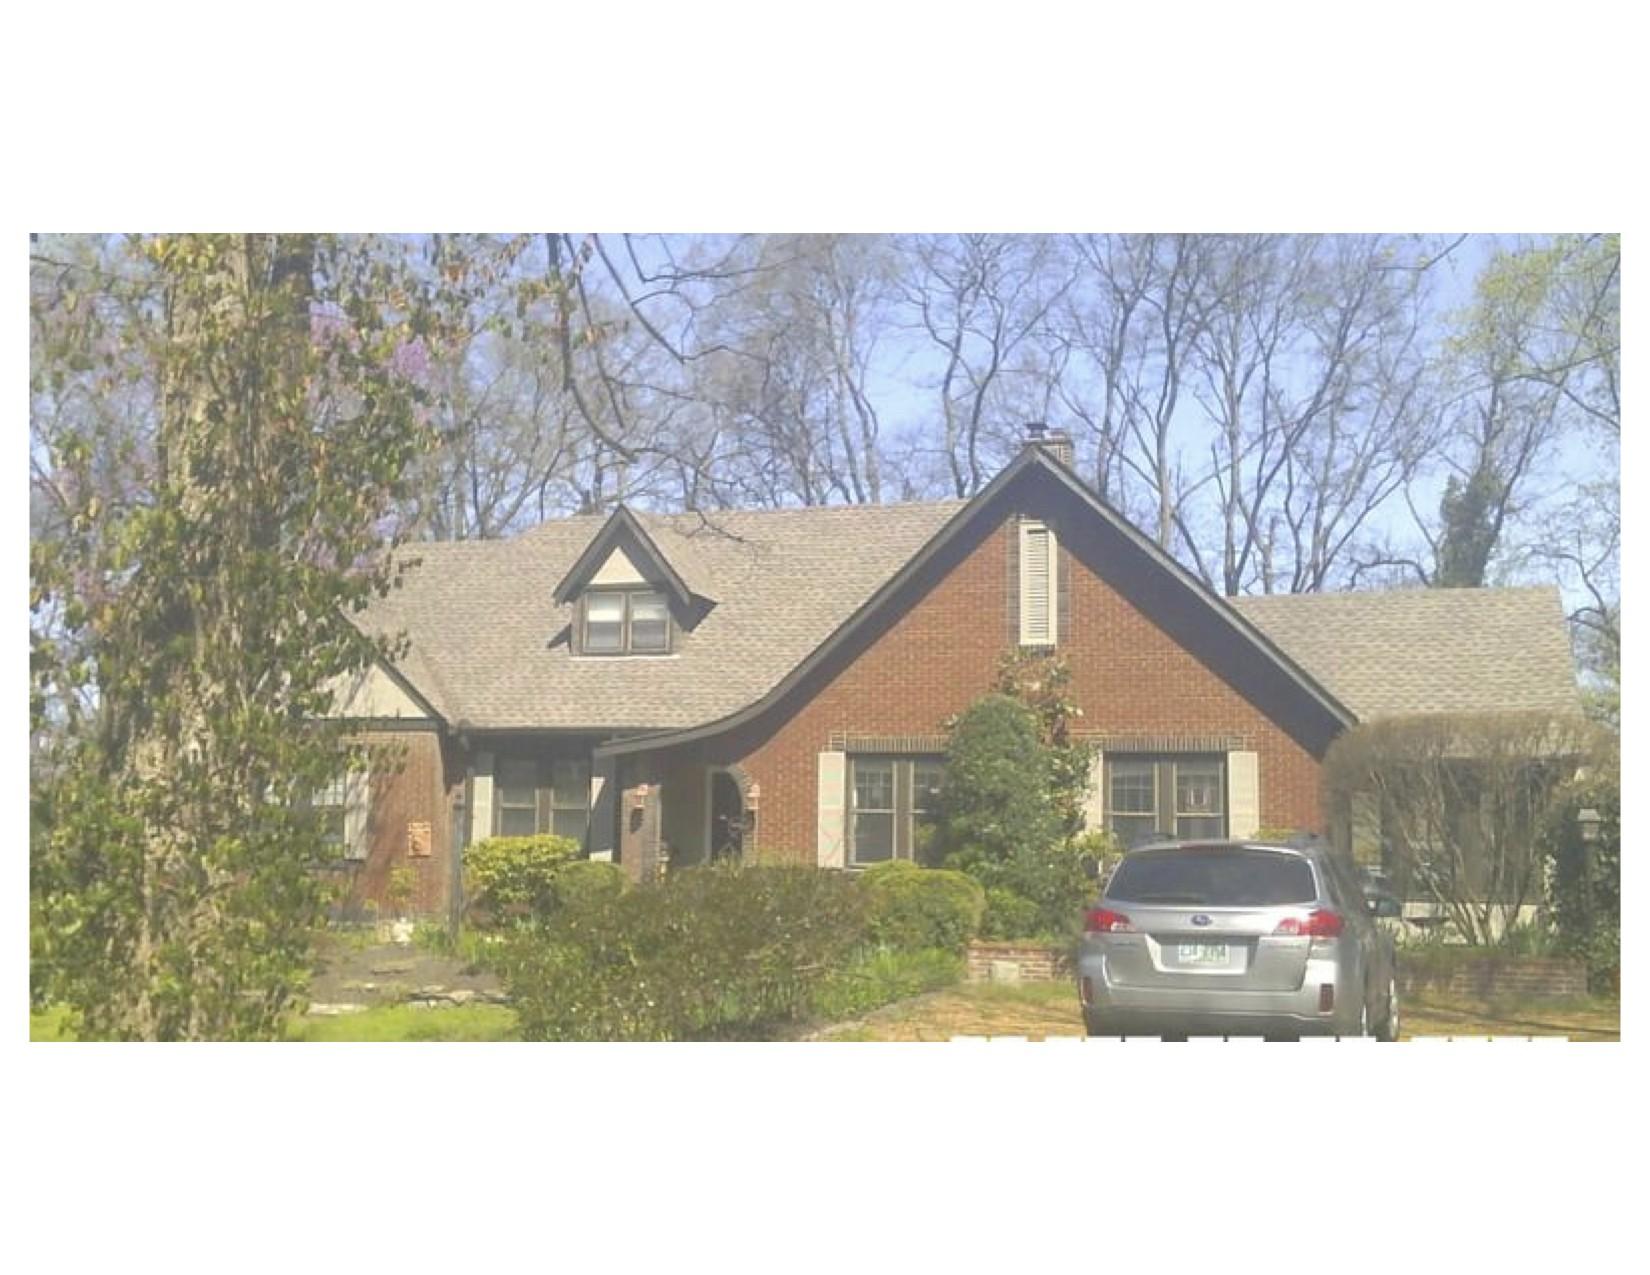 1804 Stokes Ln, Nashville, TN 37215 - Nashville, TN real estate listing